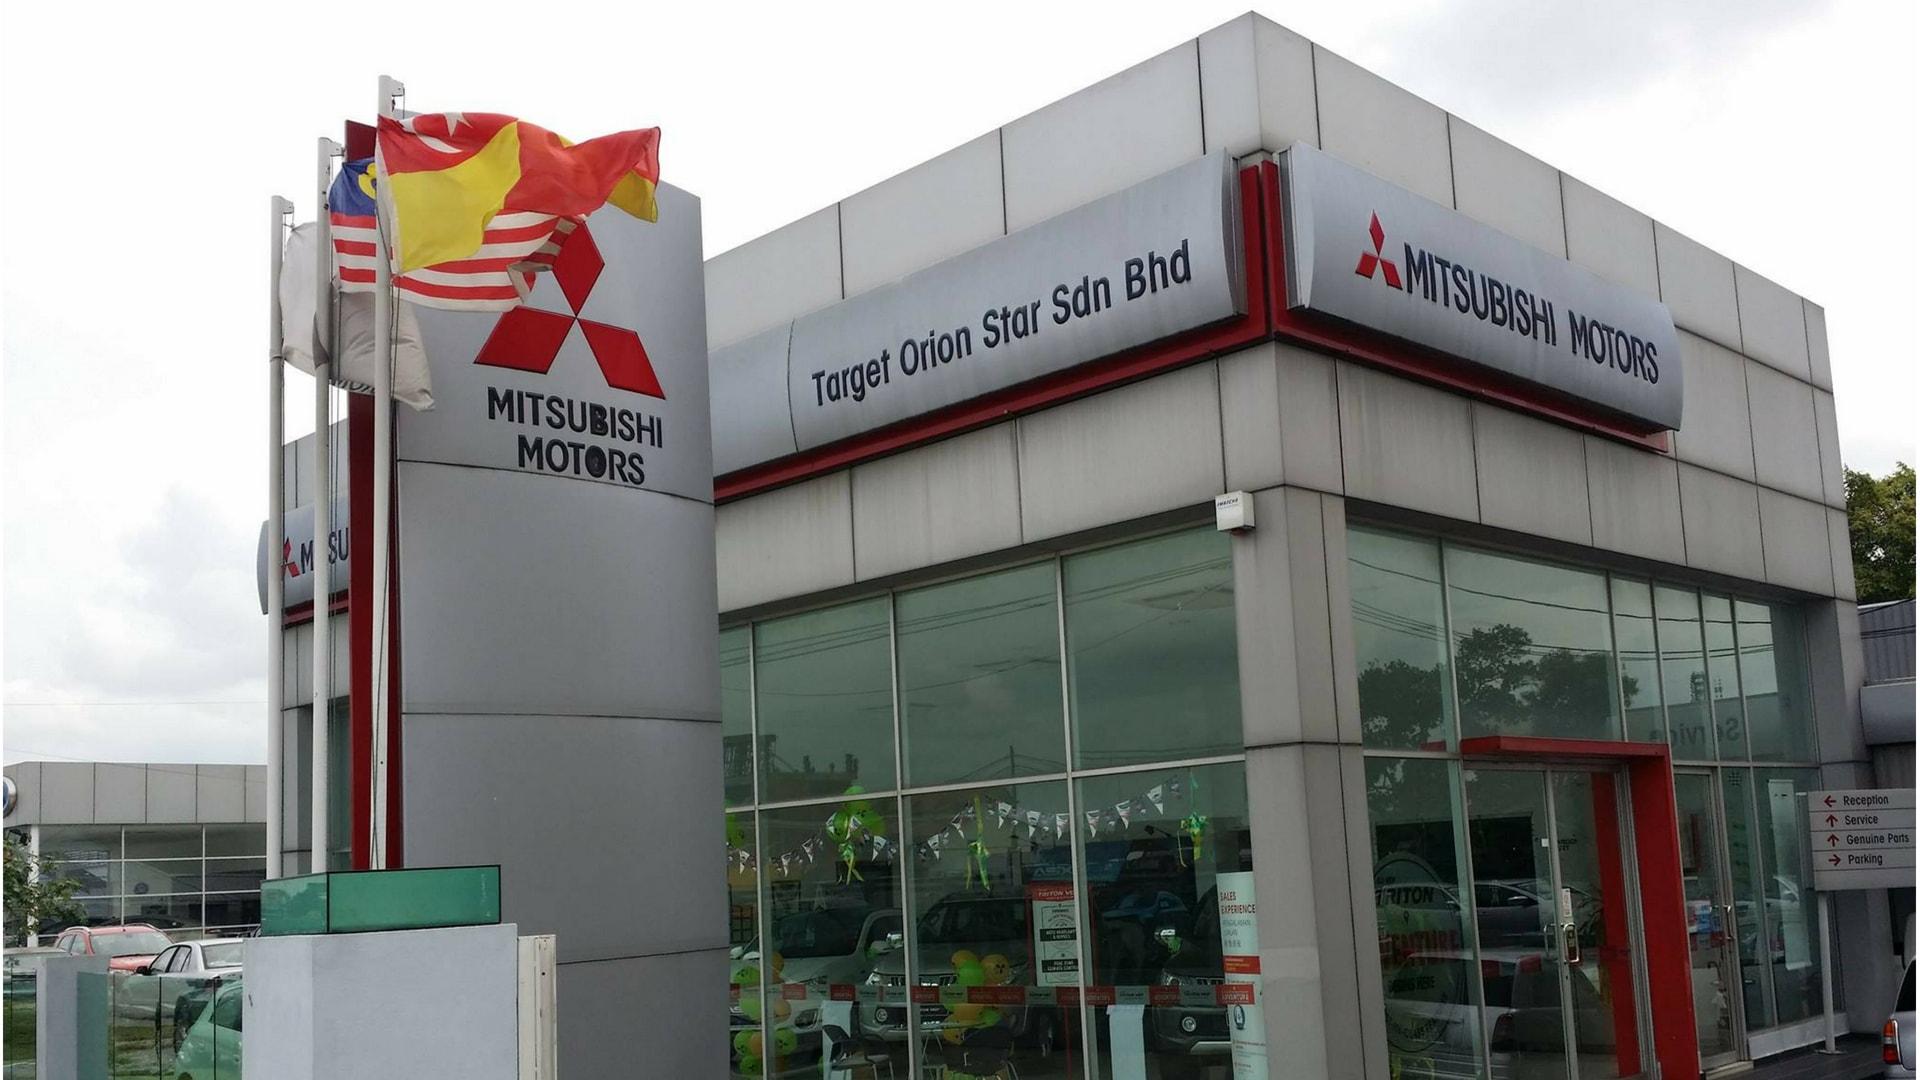 Mitsubishi Klang Target Orion Star